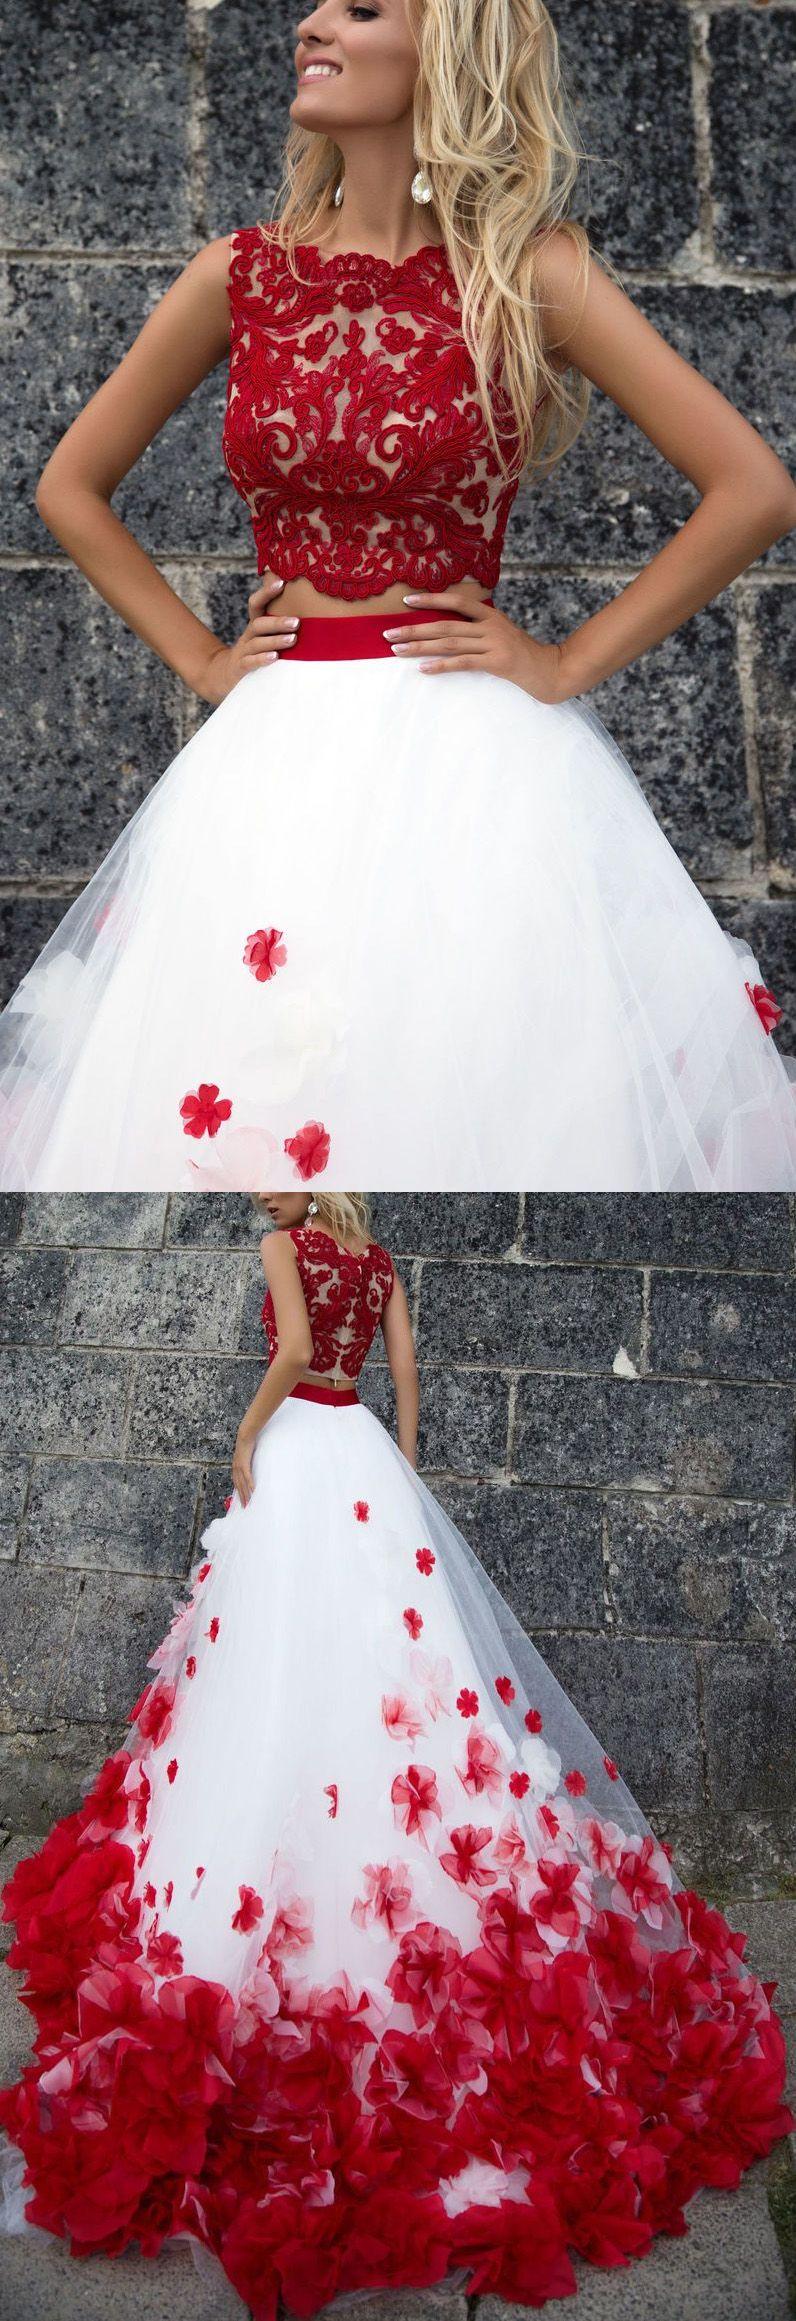 White wedding dresses long wedding dresses two pieces wedding